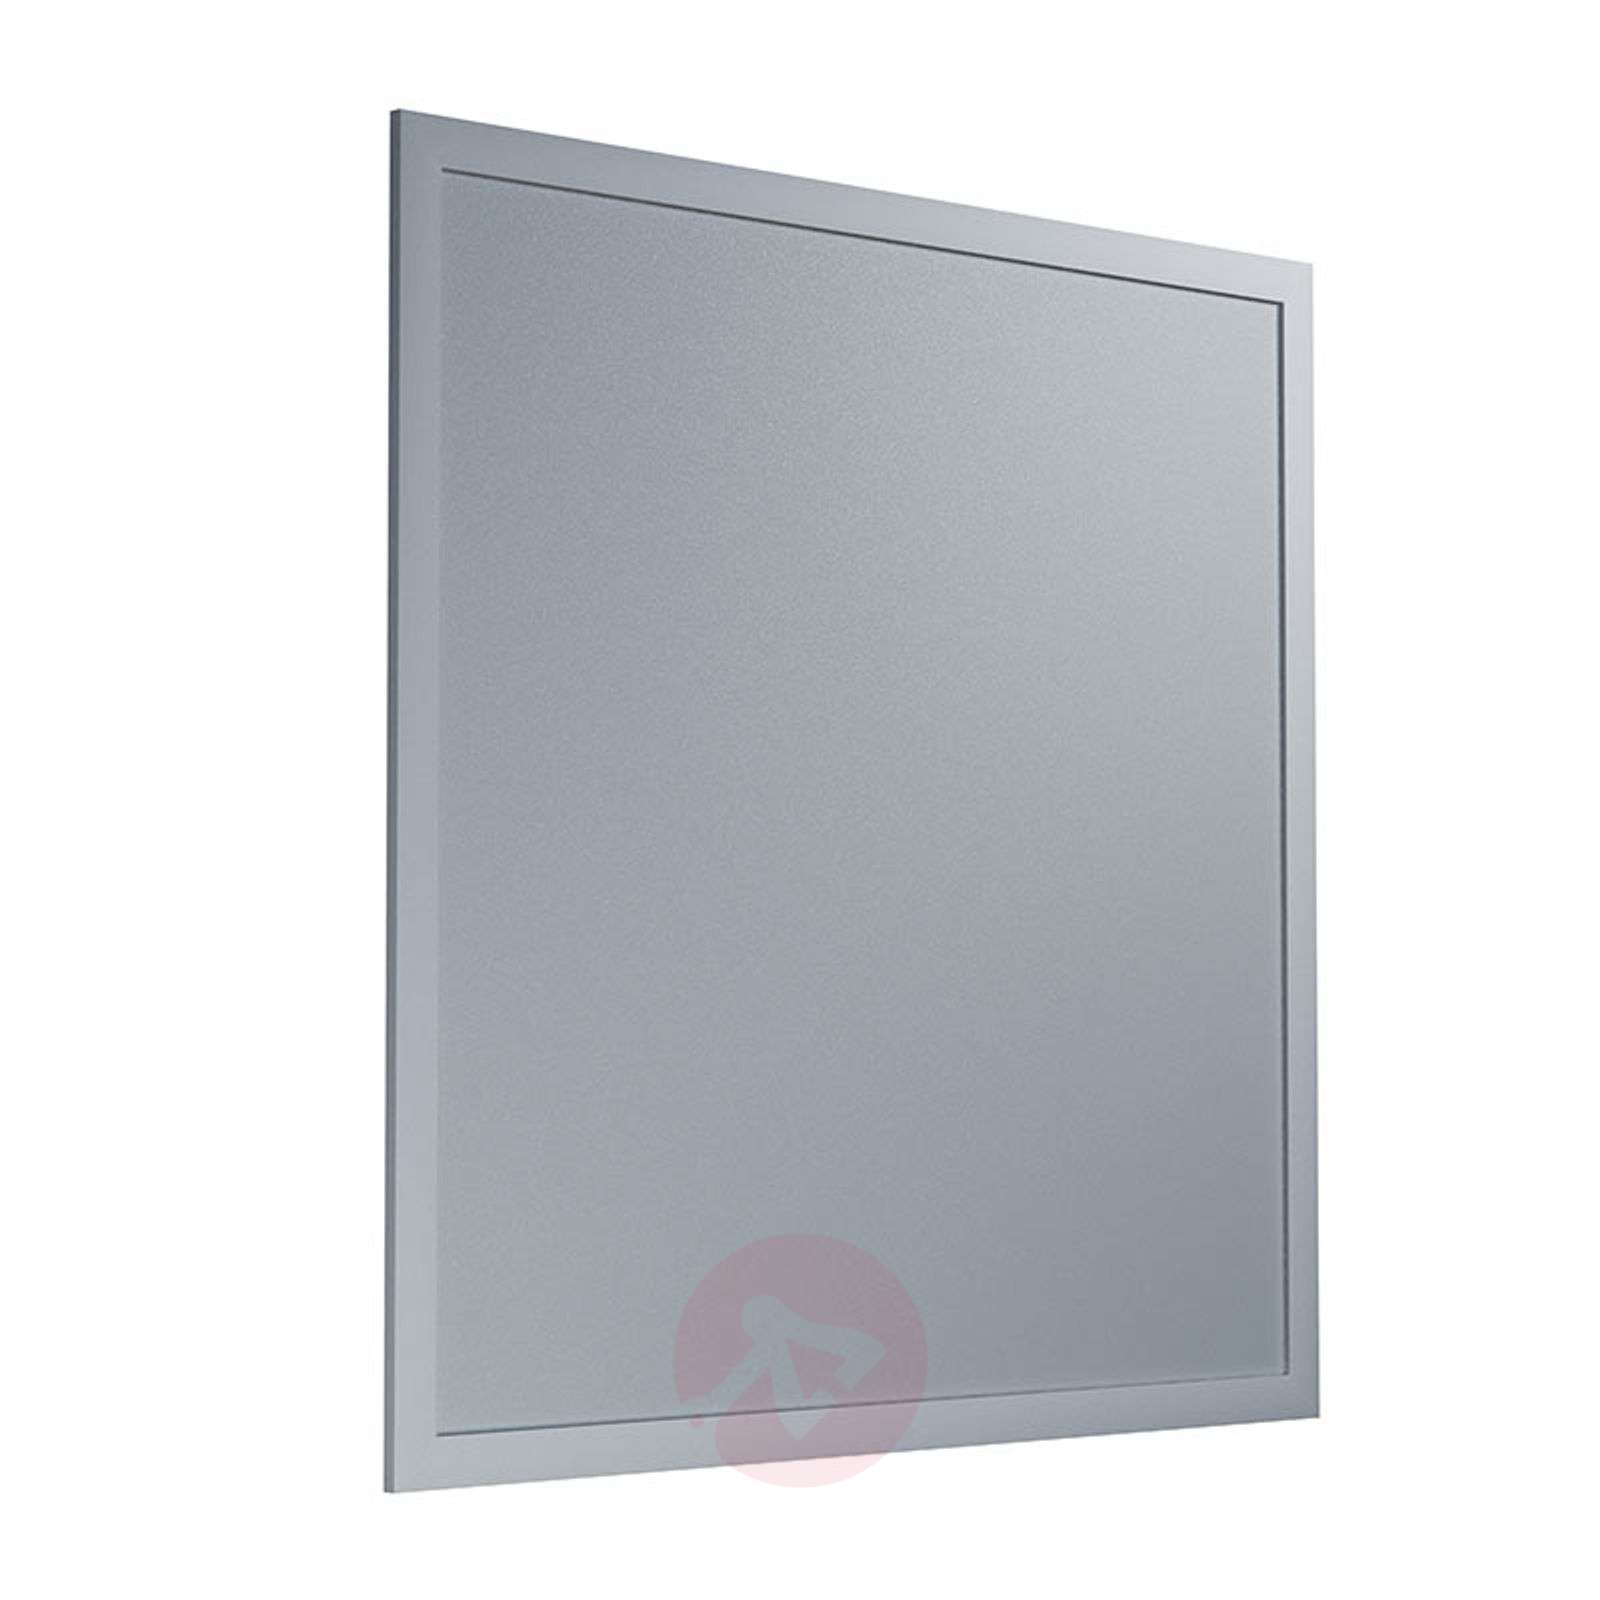 Planon Plus modern LED panel cool white-7261228-01